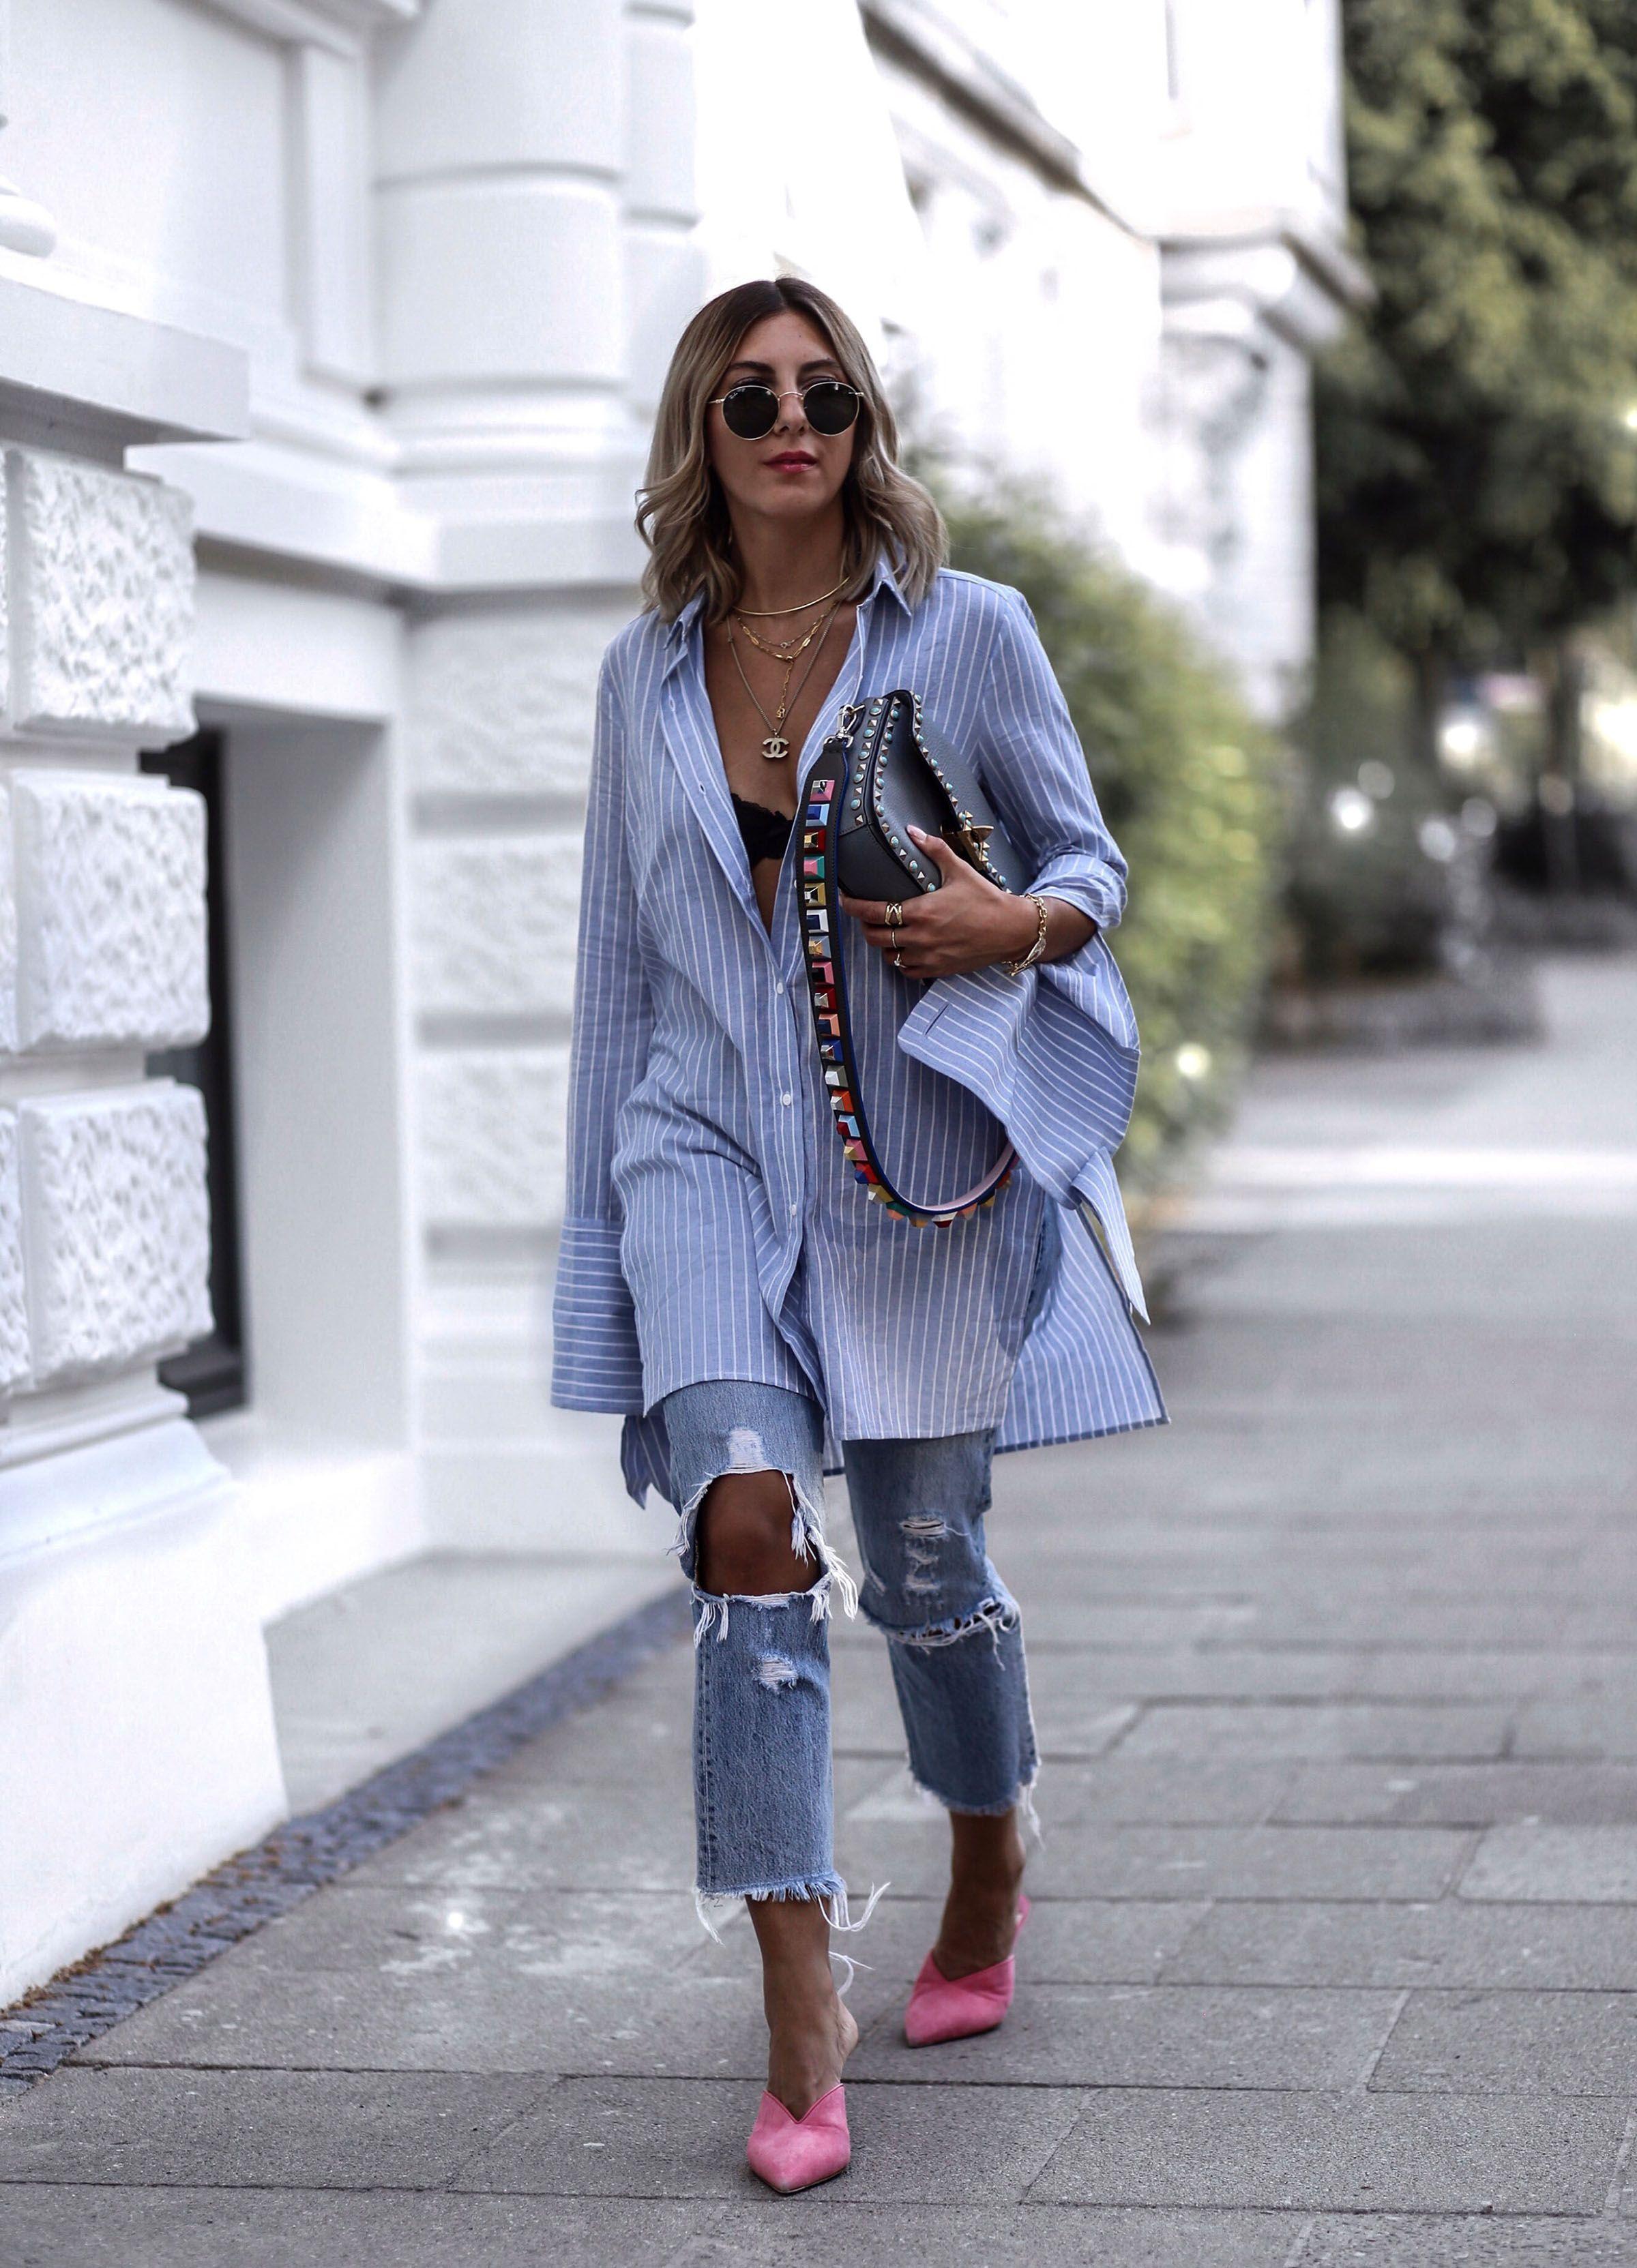 Pin de Paula Cid em Spring/Summer Inspiration   Fashion ...